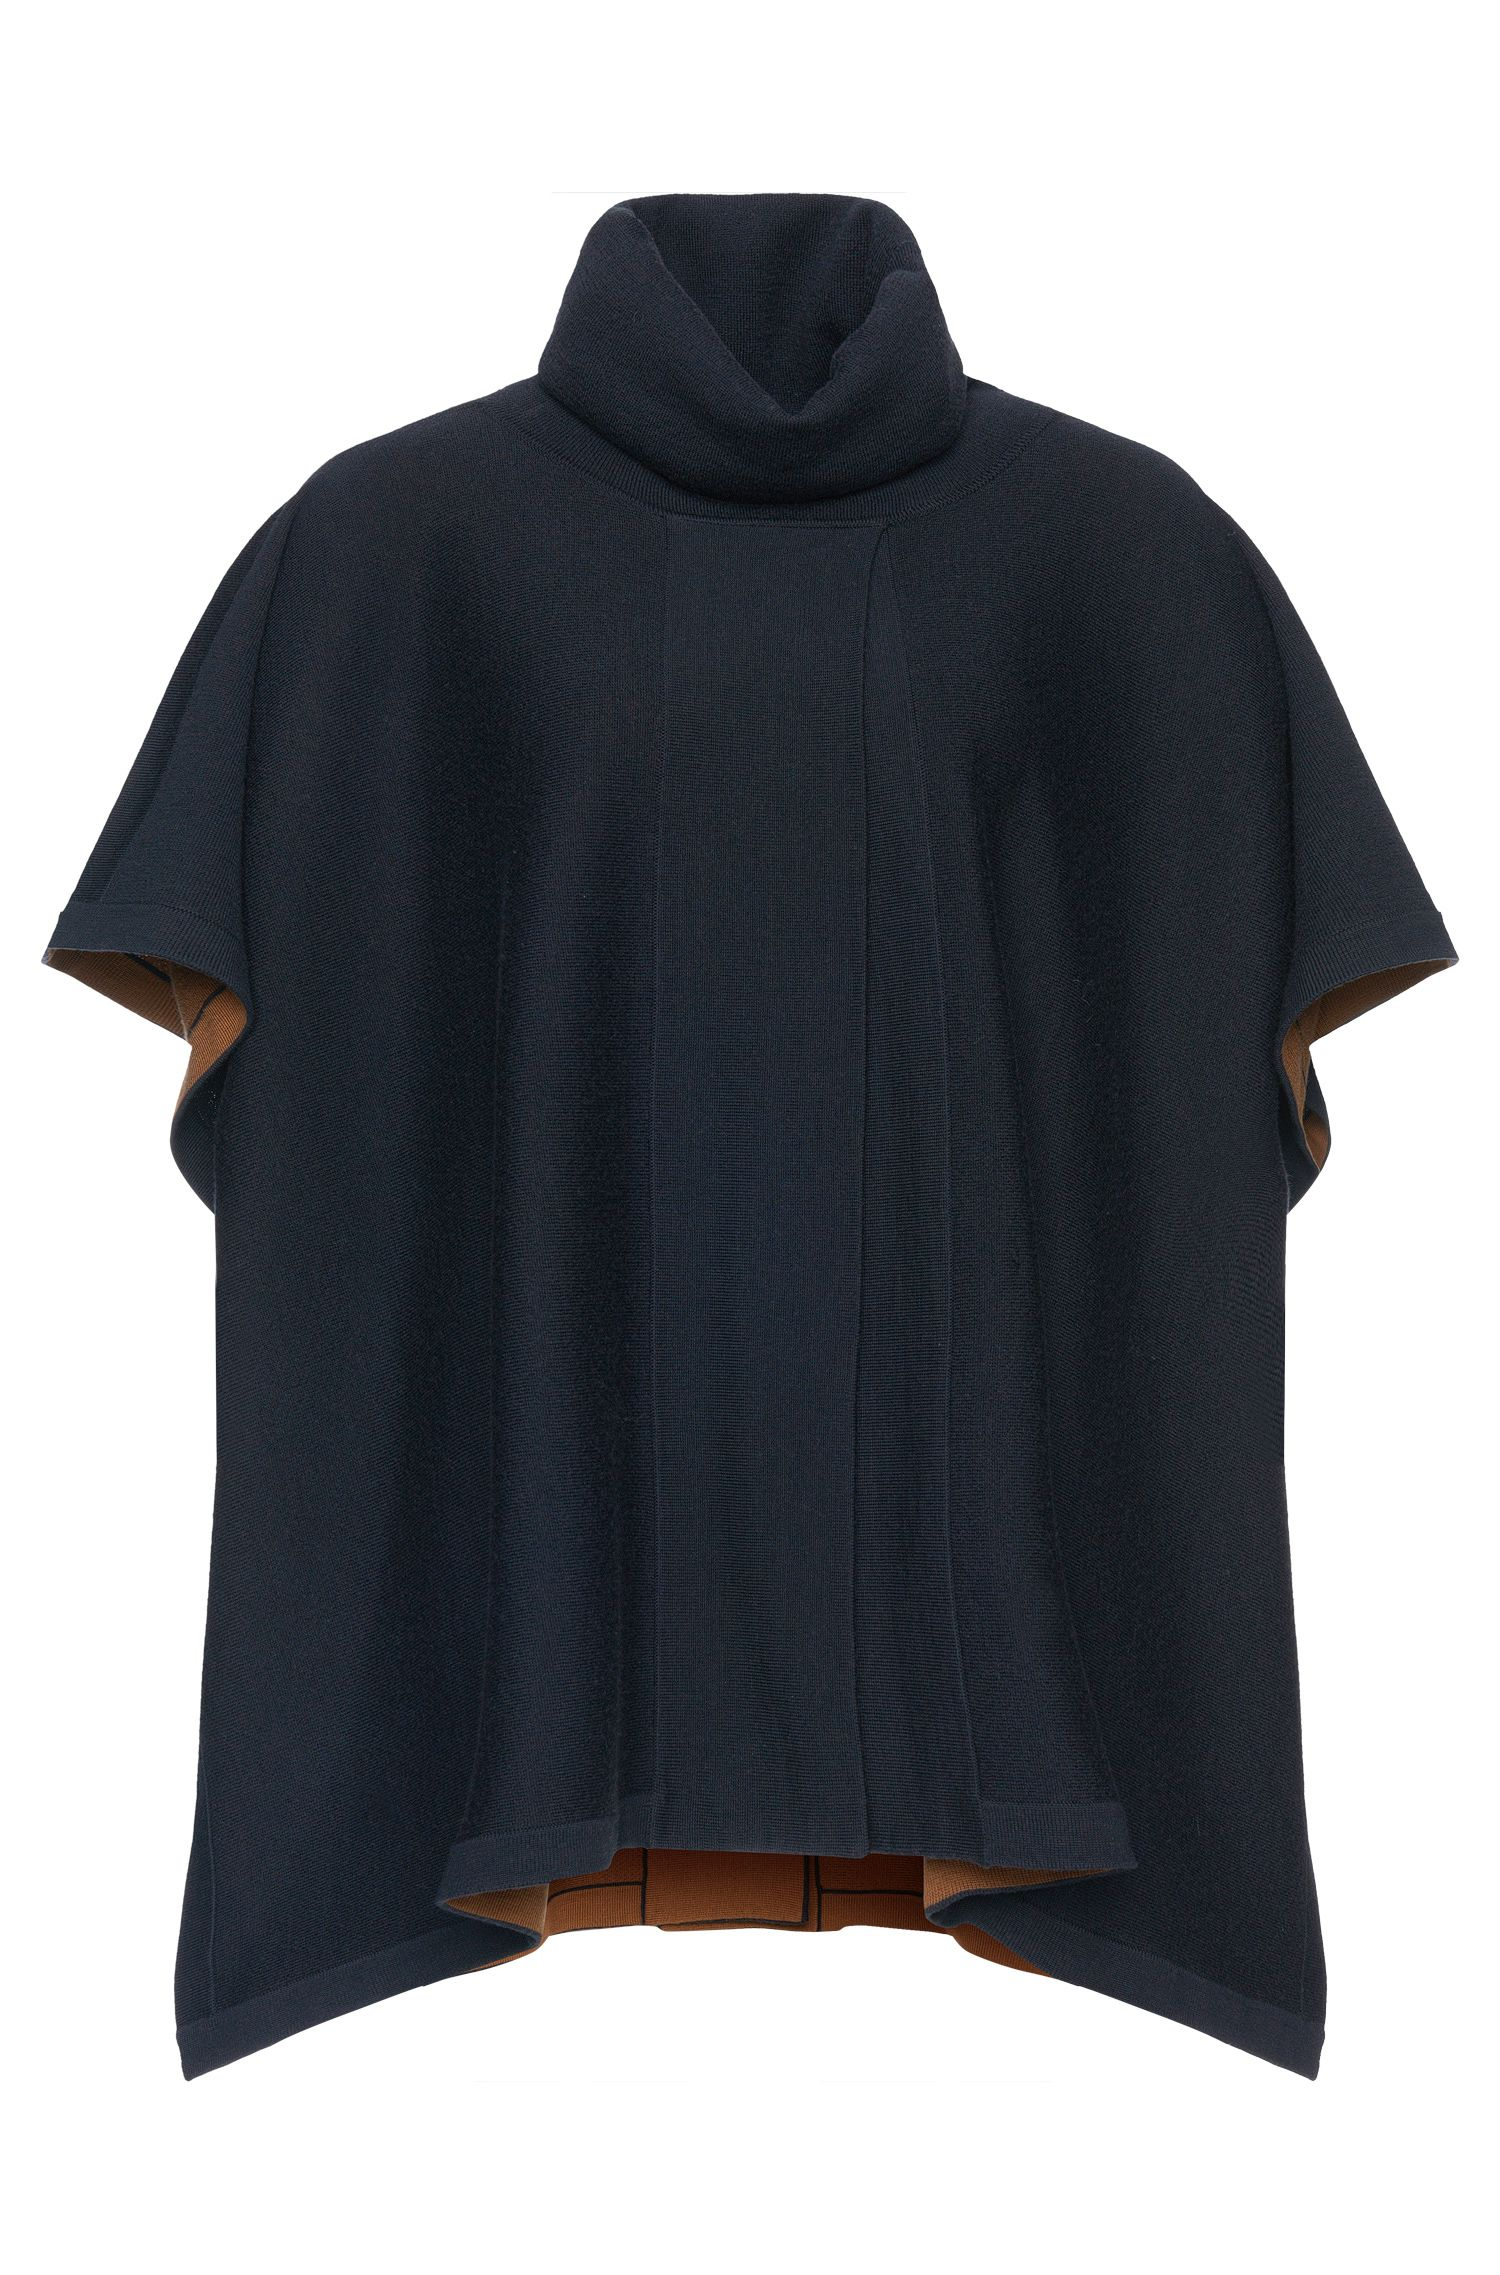 'Lerico' | Virgin Wool Reversible Turtleneck Cape